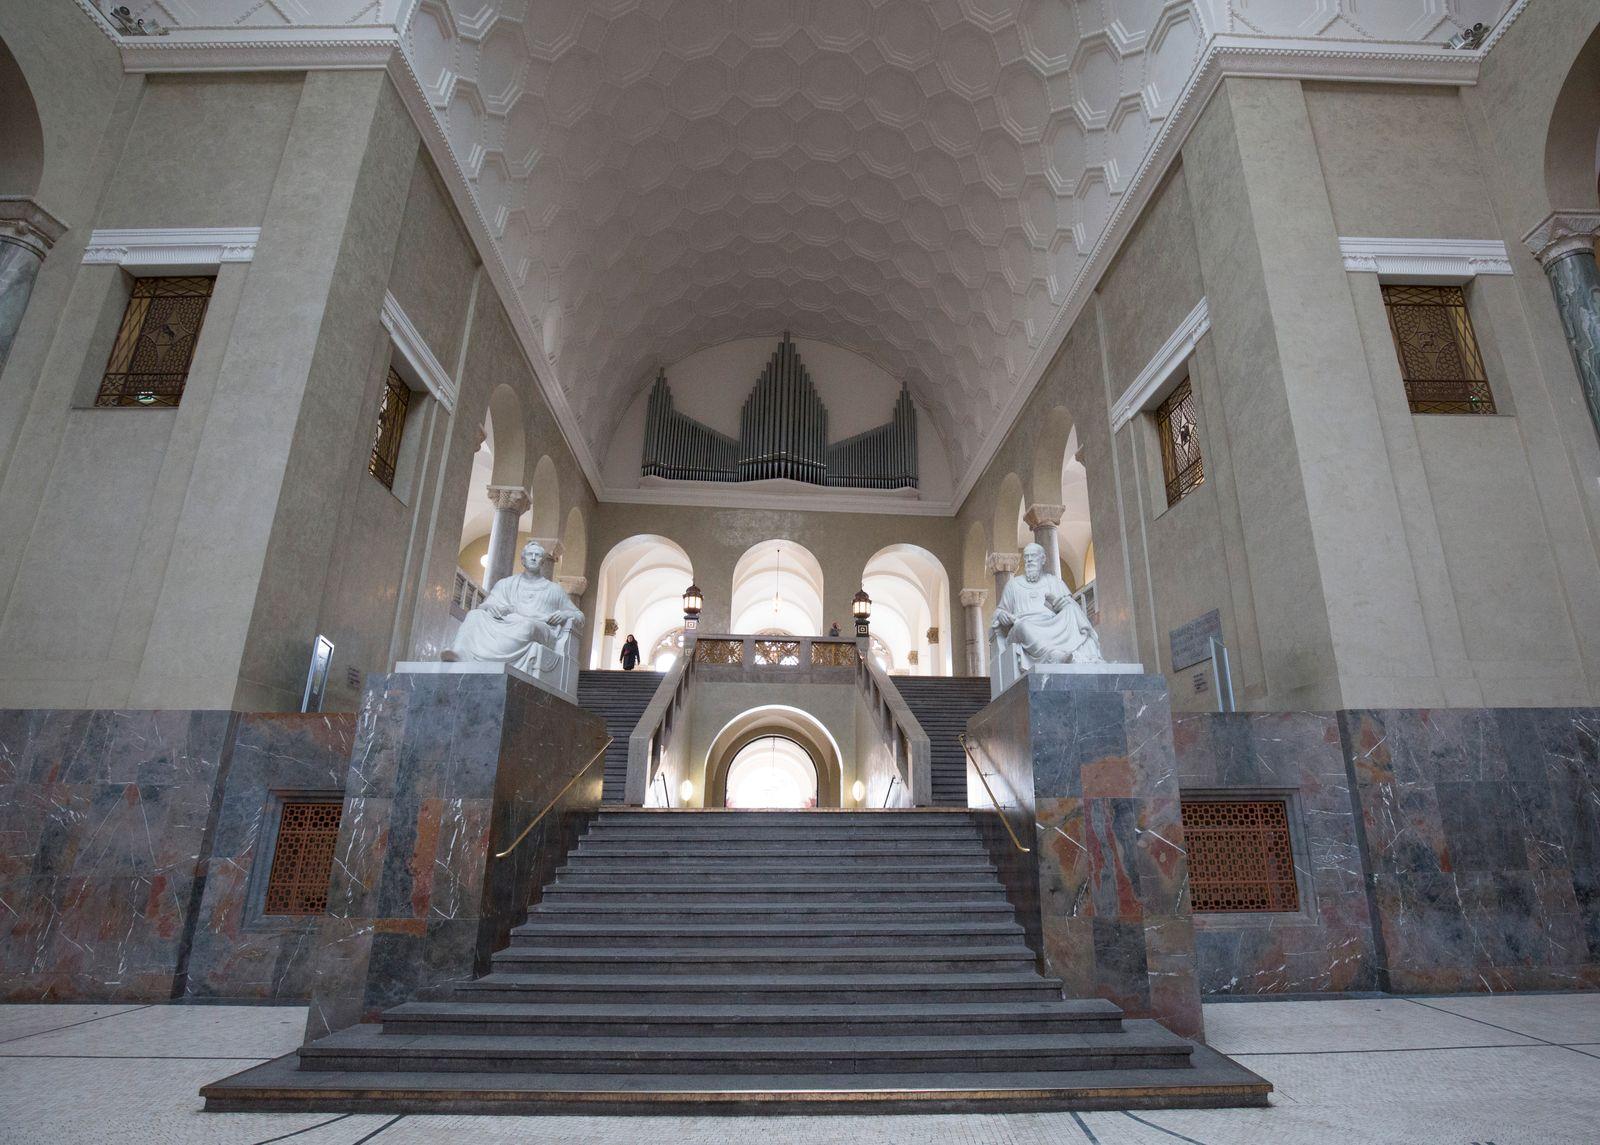 The atrium of the Ludwig-Maximilians-University in Munich.